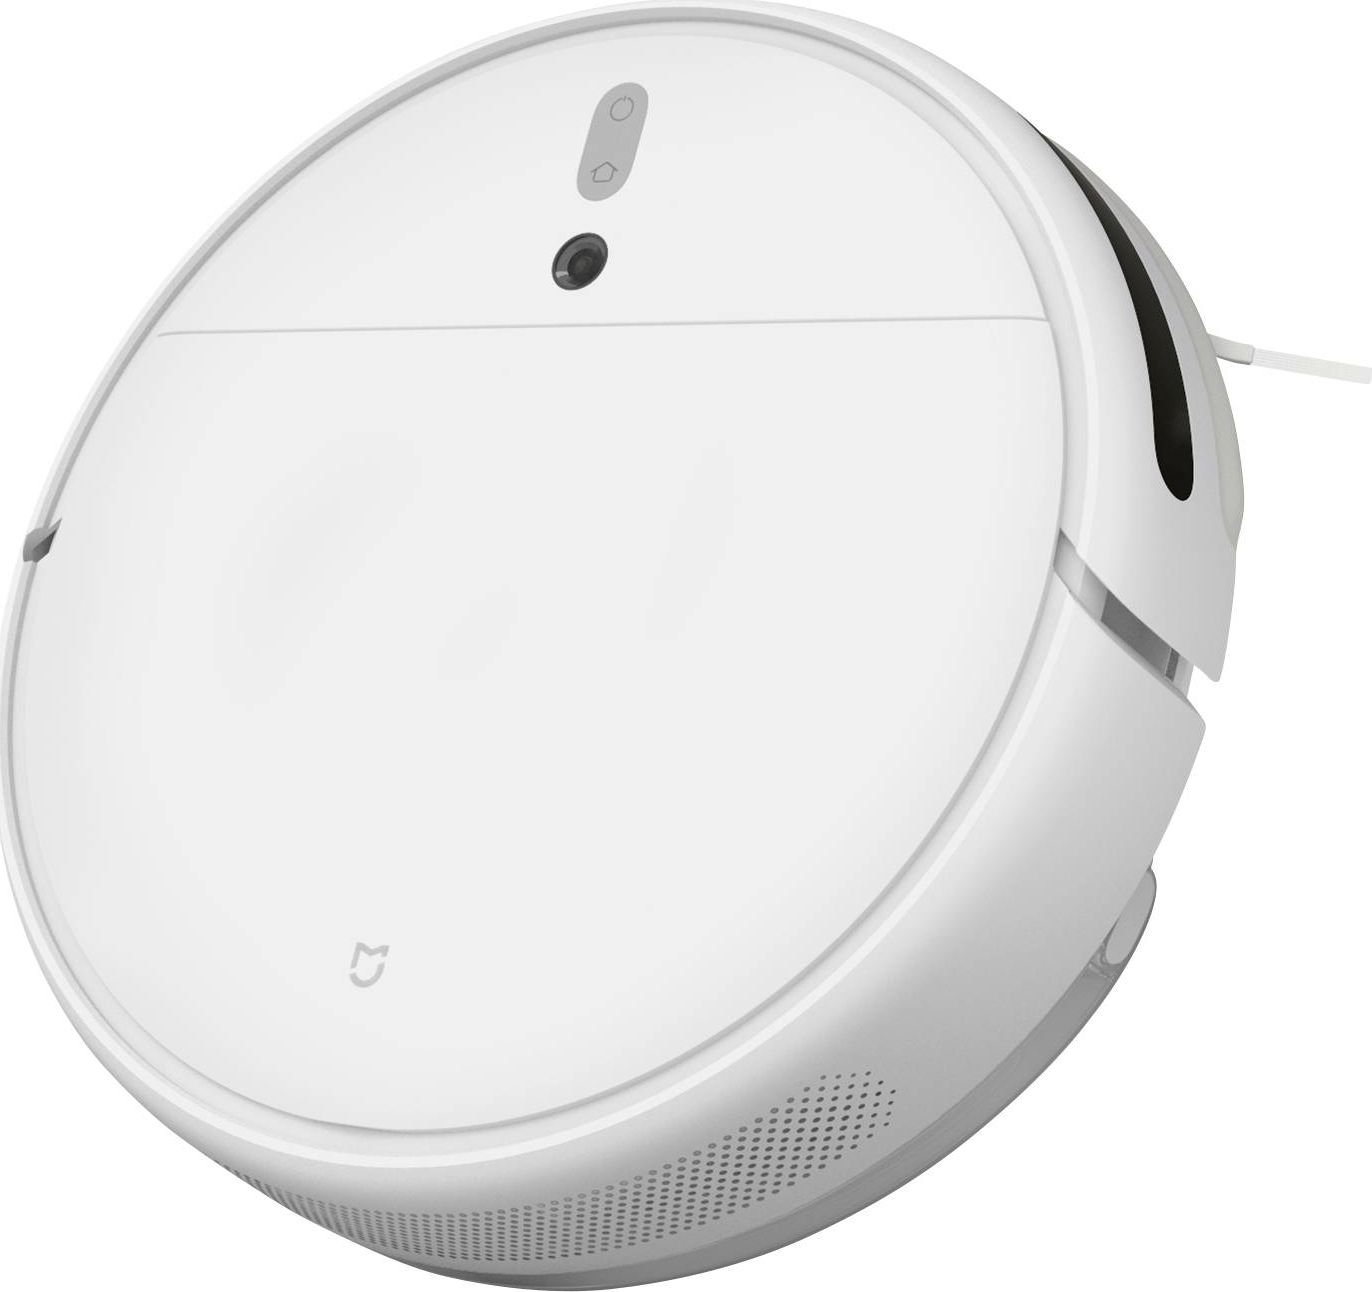 Xiaomi Mijia 1C SKV4093GL Robot, 150 min, 0.6 L, 50 dB; Dry, White, Lithium robots putekļsūcējs